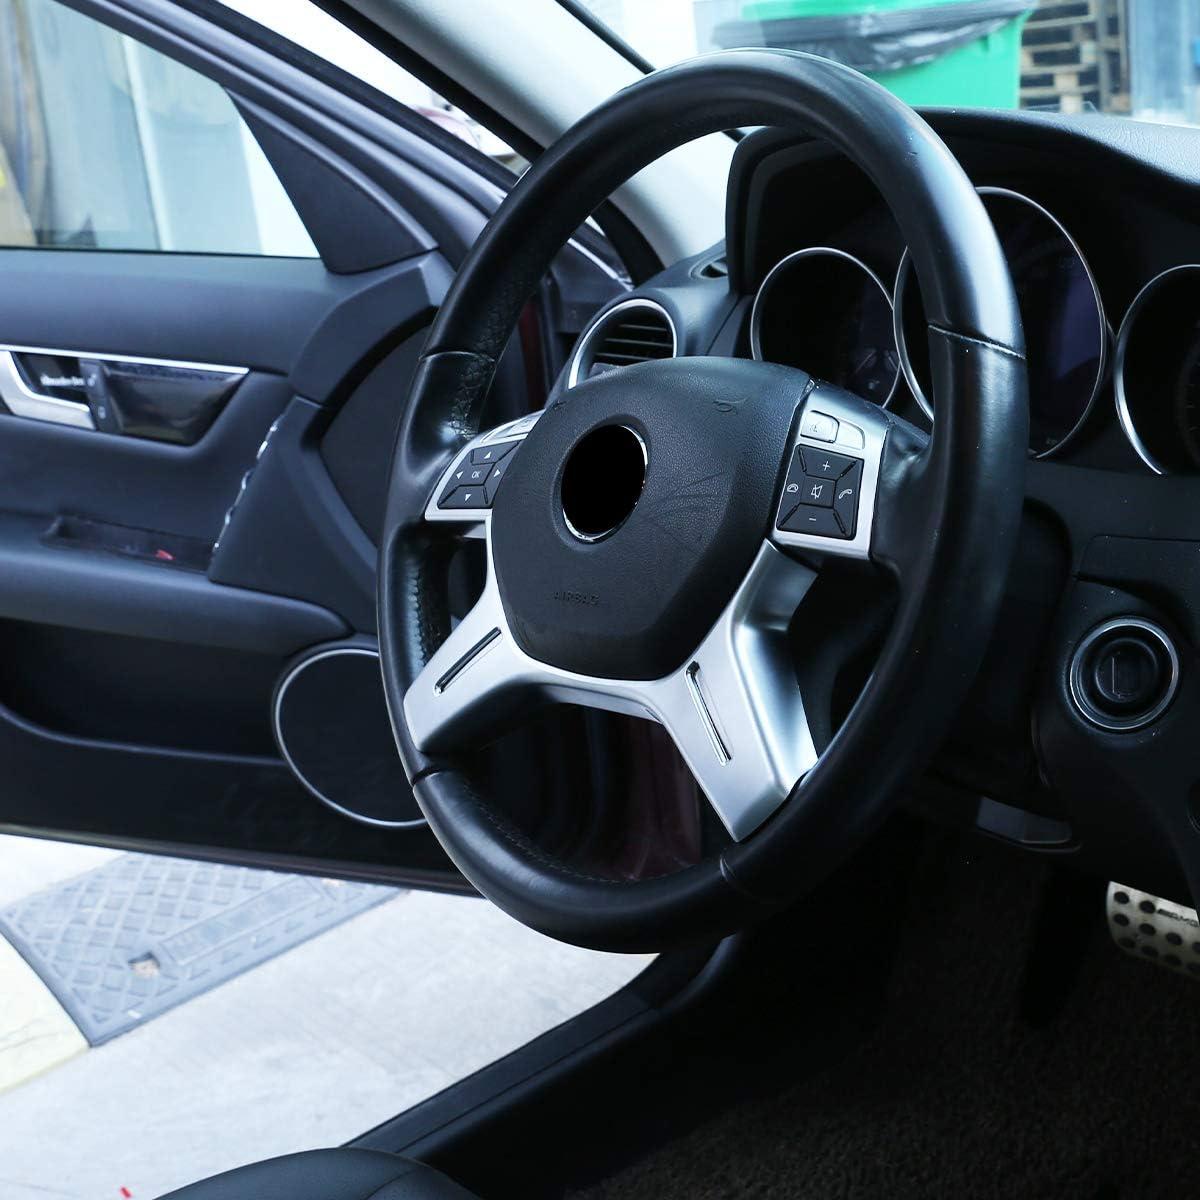 DIYUCAR Matte Silver ABS Chrom f/ür Benz C-Klasse W204 C180 C200 2011-2013 Auto Lenkraddekoration Zubeh/ör E ML GL-Klasse W212 X166 W166